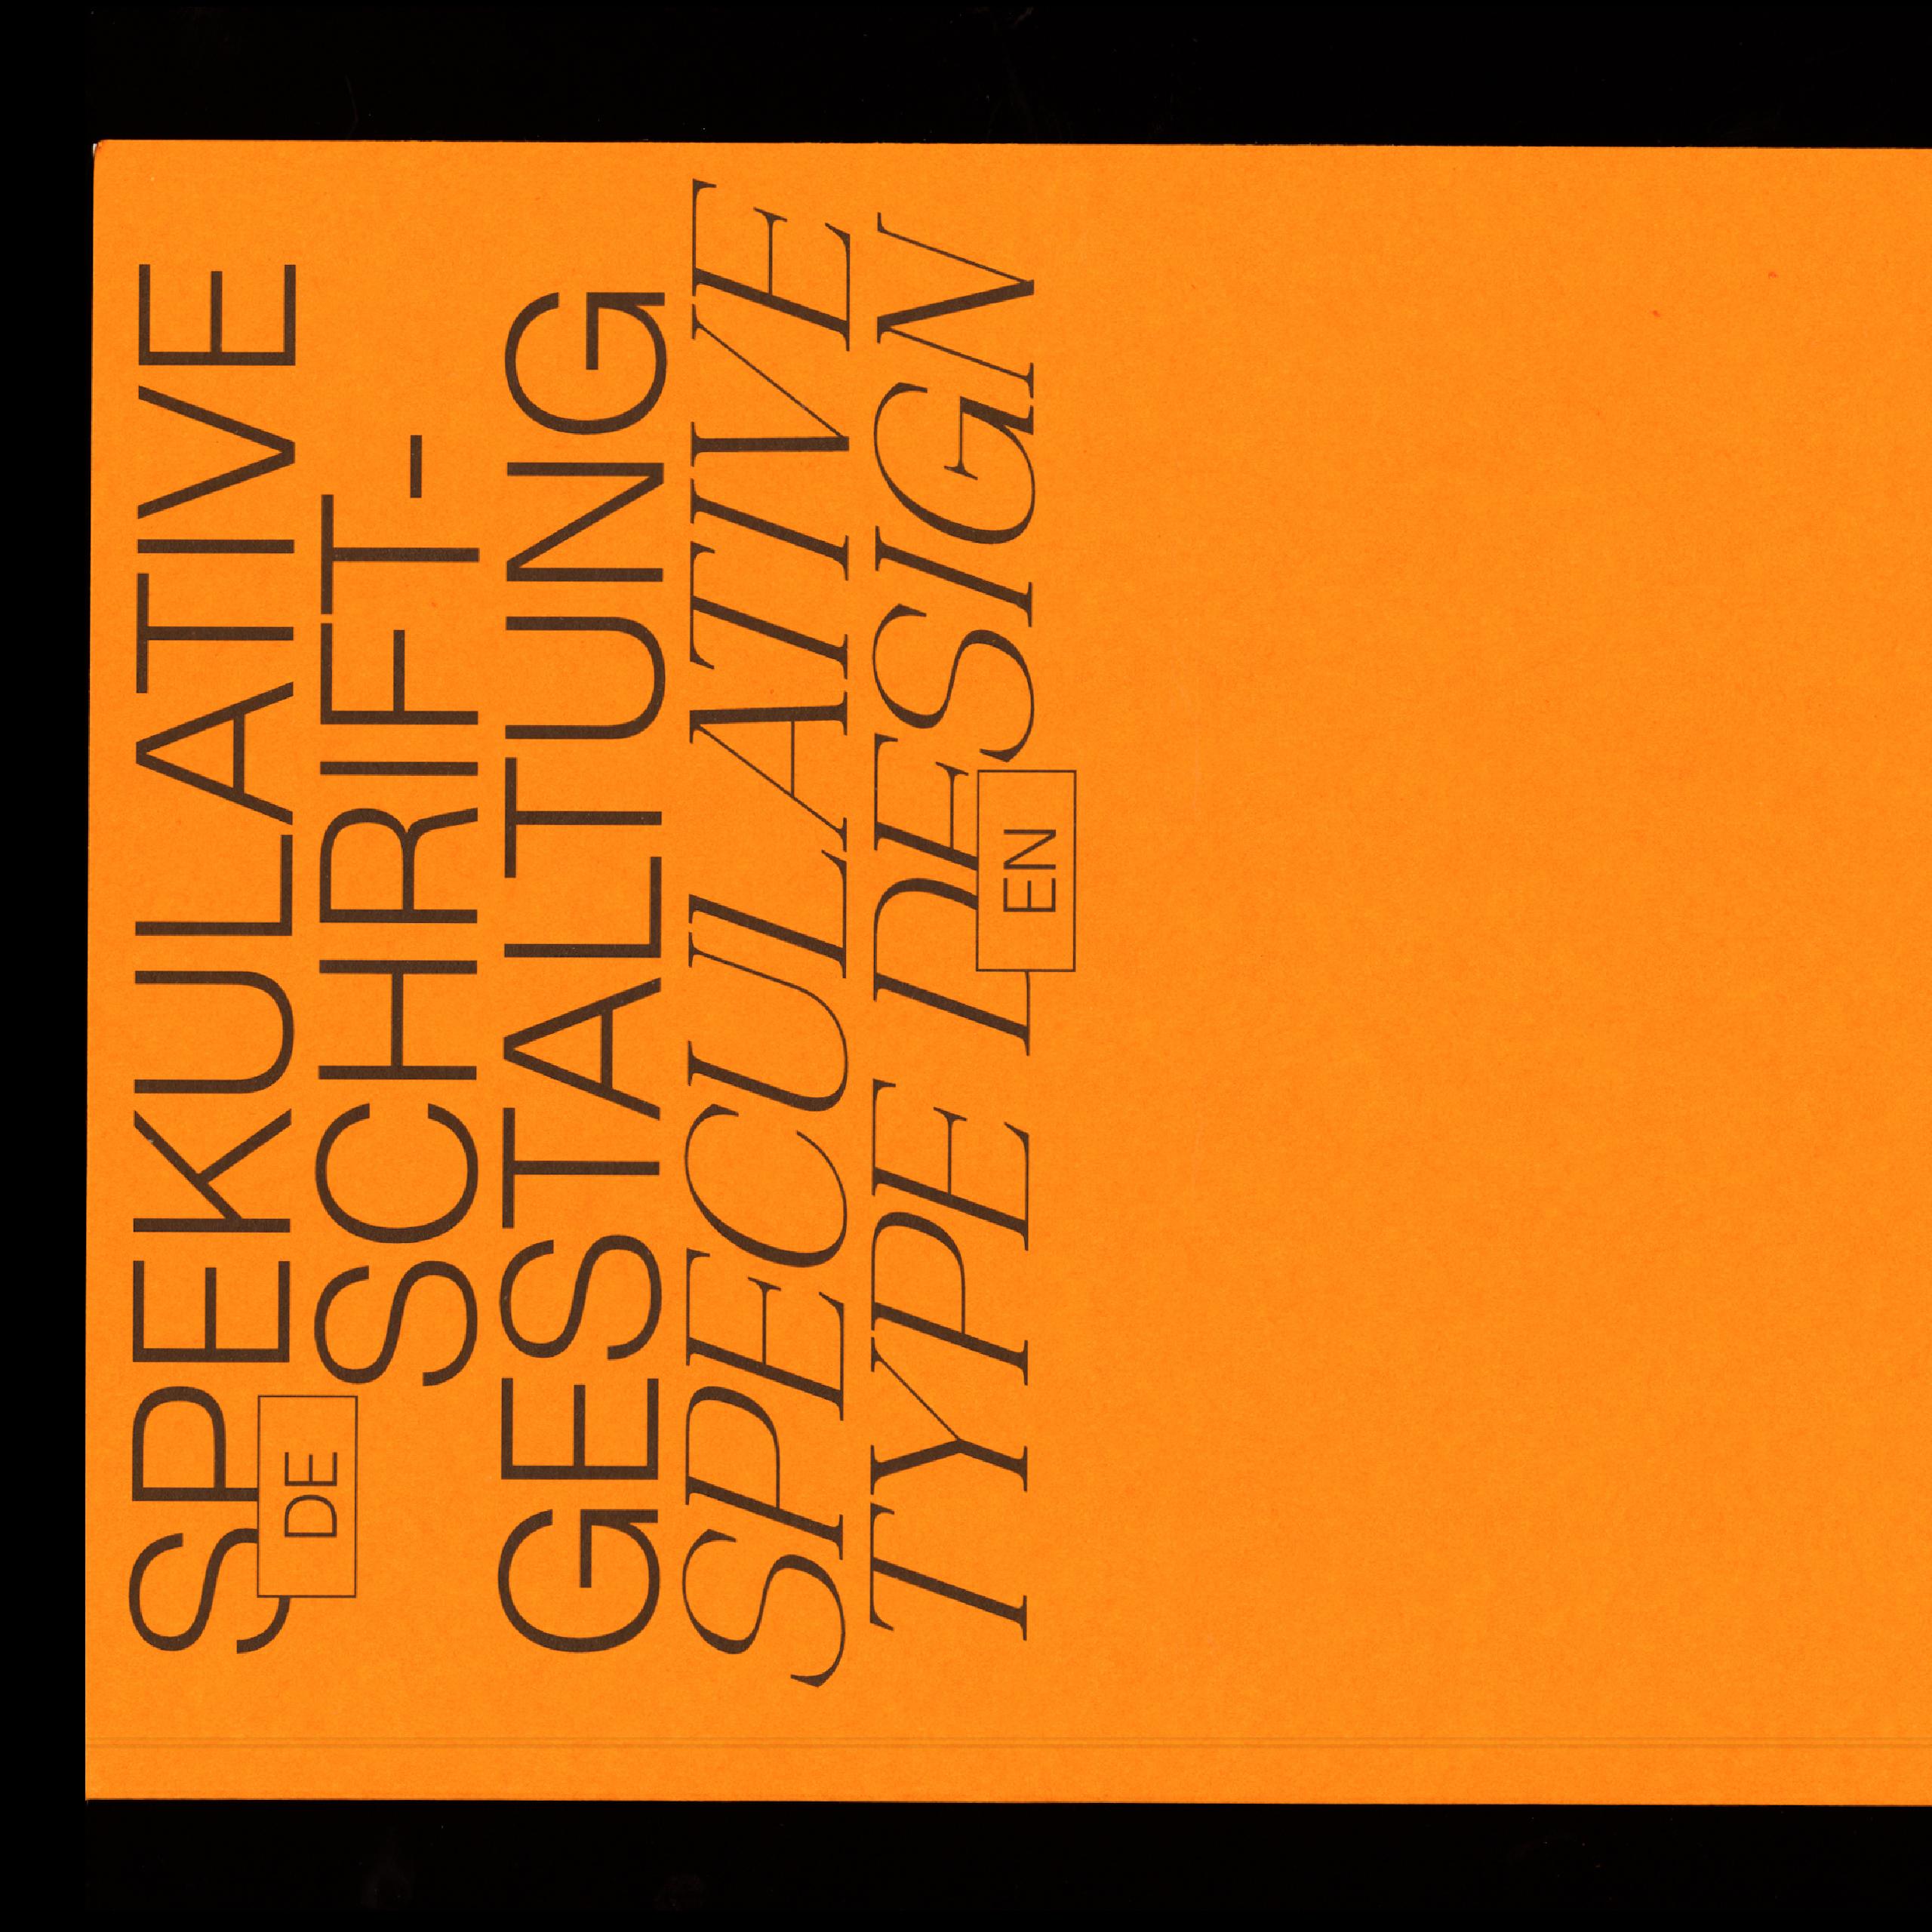 Daniel_Stuhlpfarrer_Spekulative-Schriftgestaltung-Speculative-Type-Design_WEB58